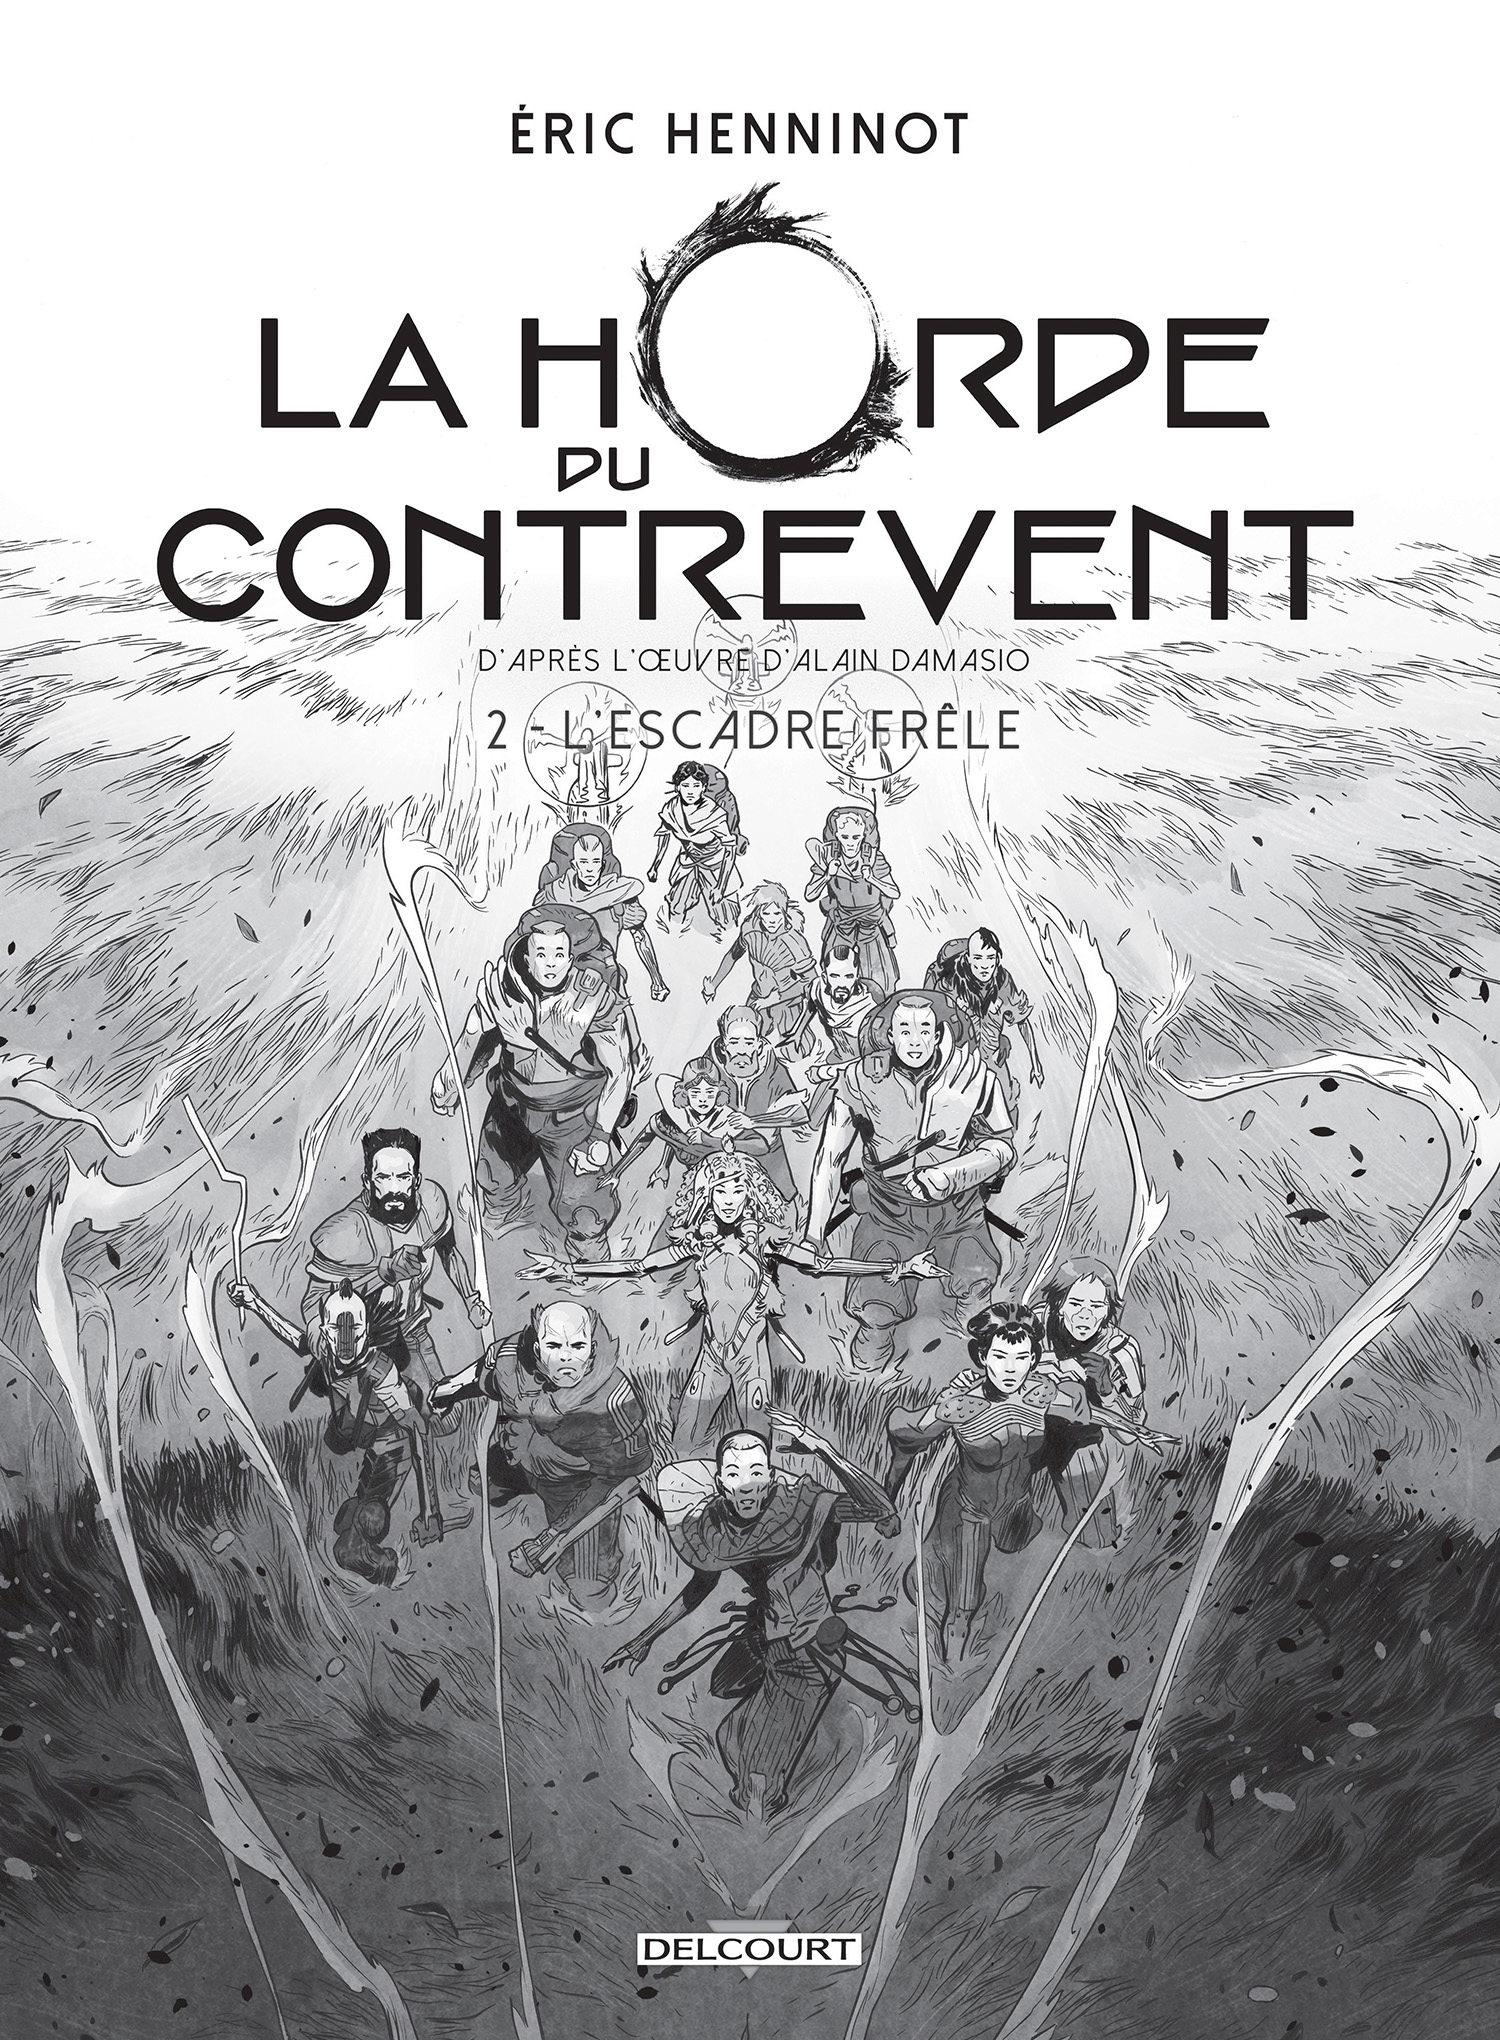 fantastique - Alain Damasio  - Page 3 Horded12